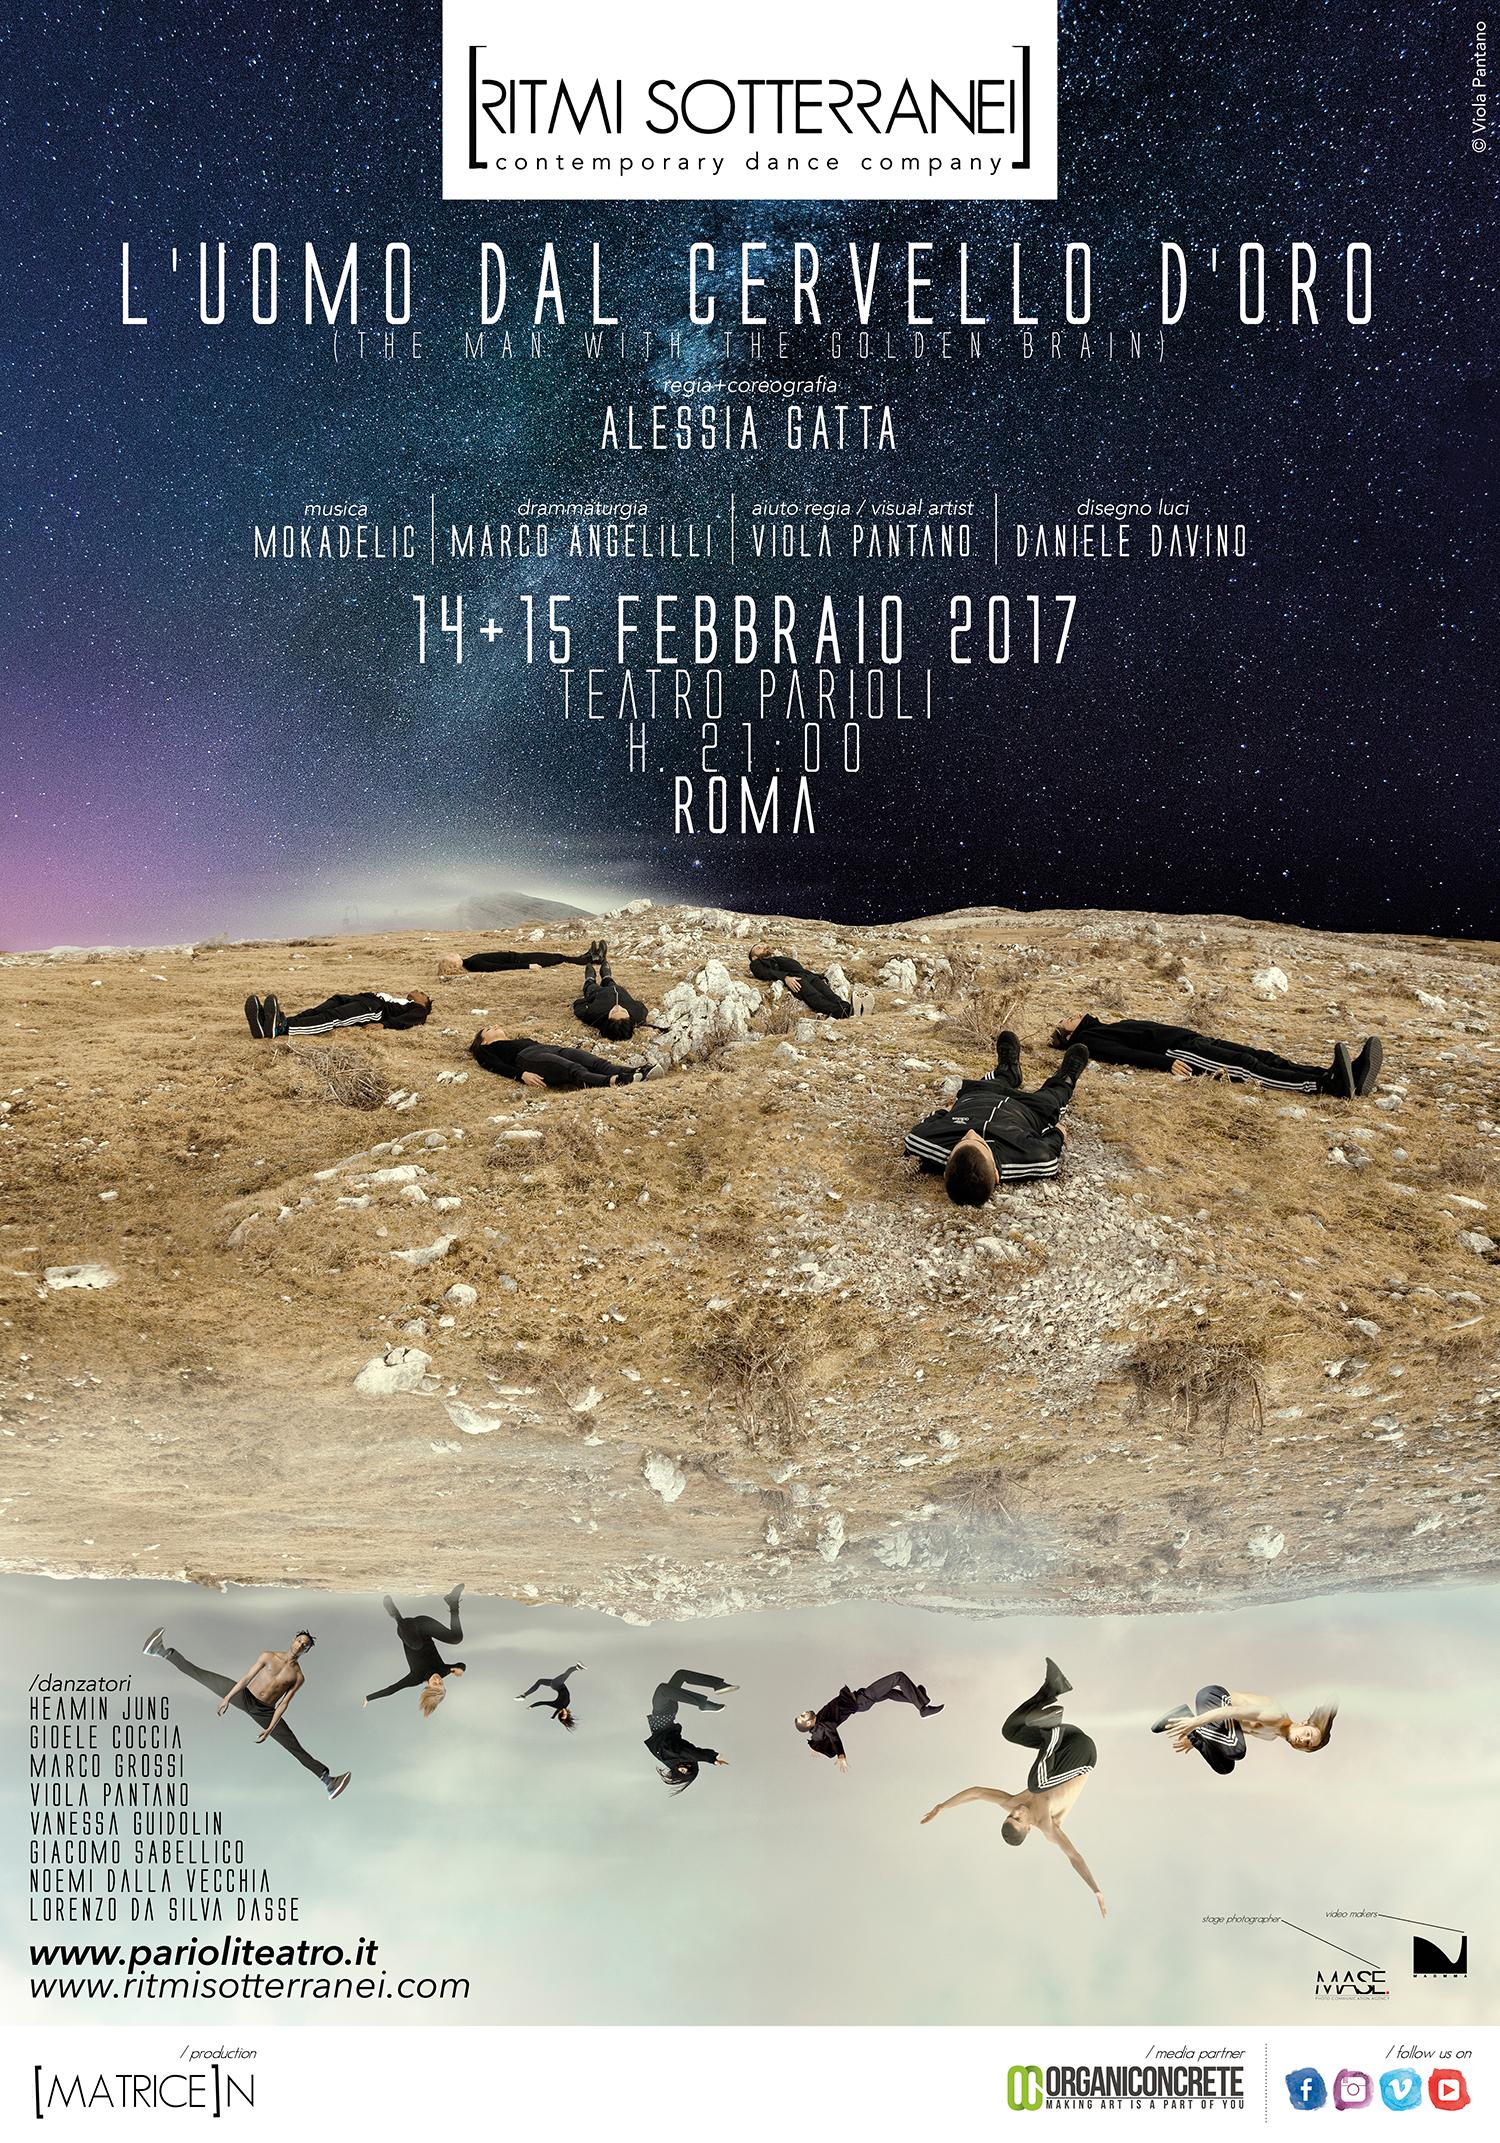 Manifesto-teatroparioli-UCD-ORGANICONCRETE